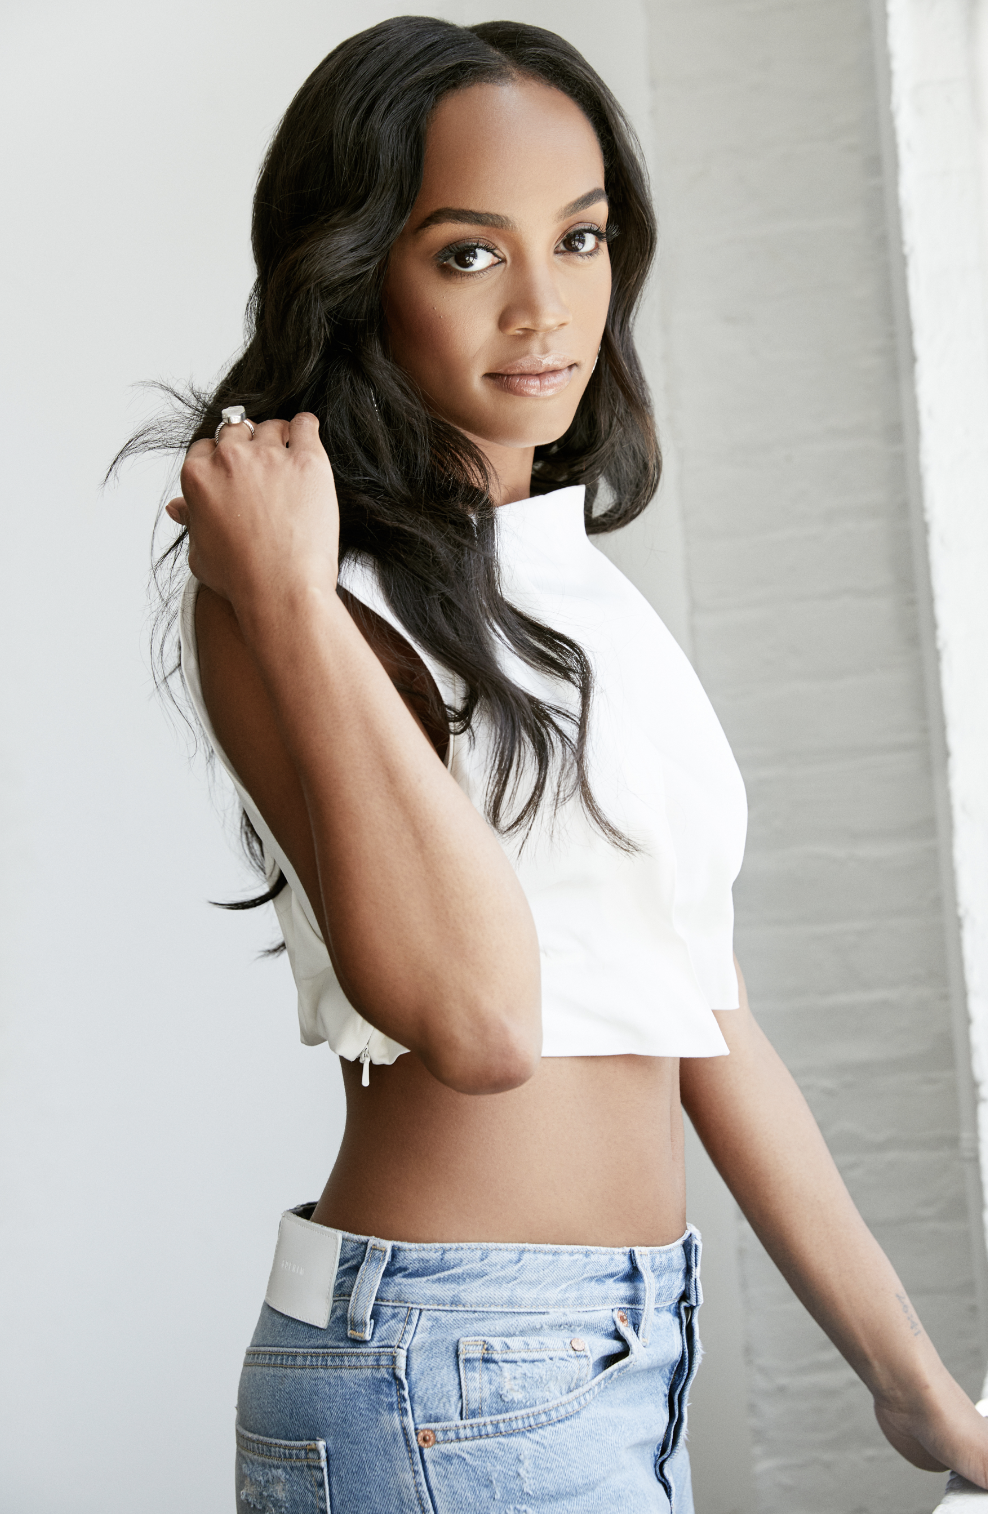 Rachel Lindsay, The Bachelorette / Wearing Gemma Top